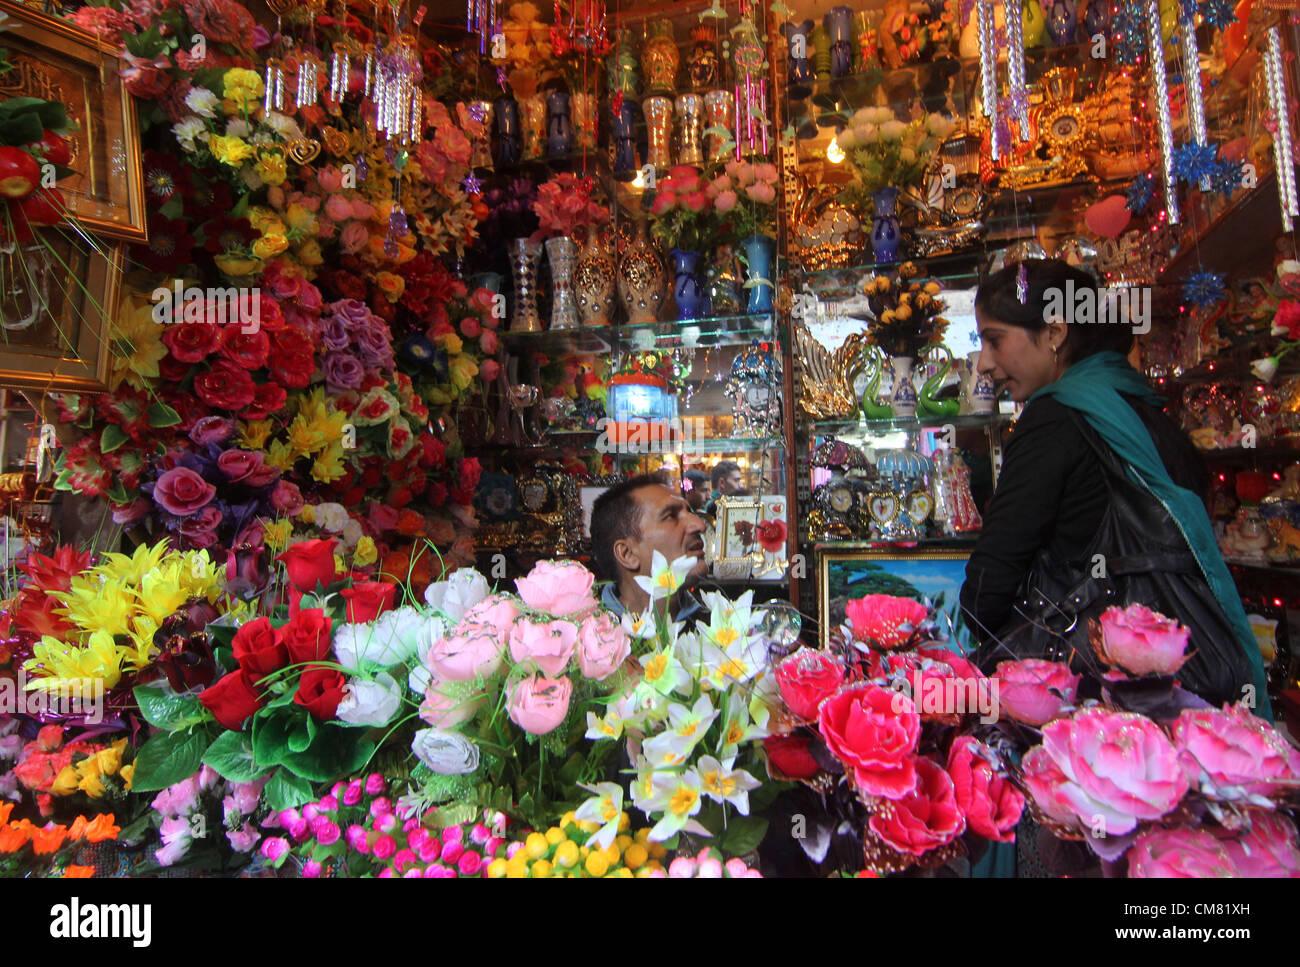 A kashmiri muslim girl stock photos a kashmiri muslim girl stock oct 25 2012 a kashmiri muslim girl purchases flowers from a flower shop izmirmasajfo